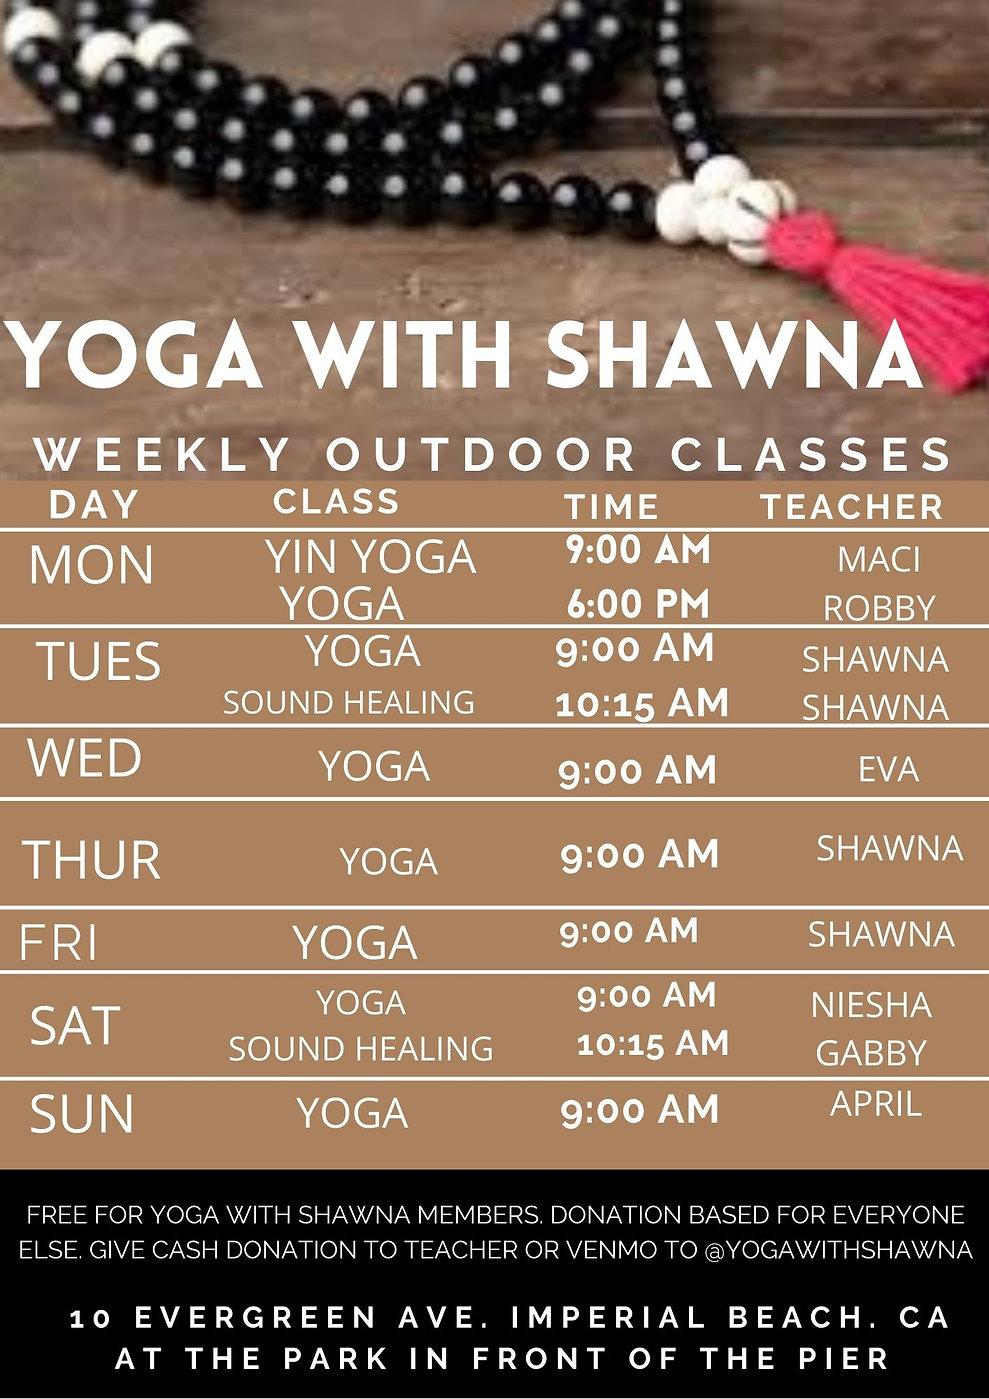 outdoor yoga yws.jpg